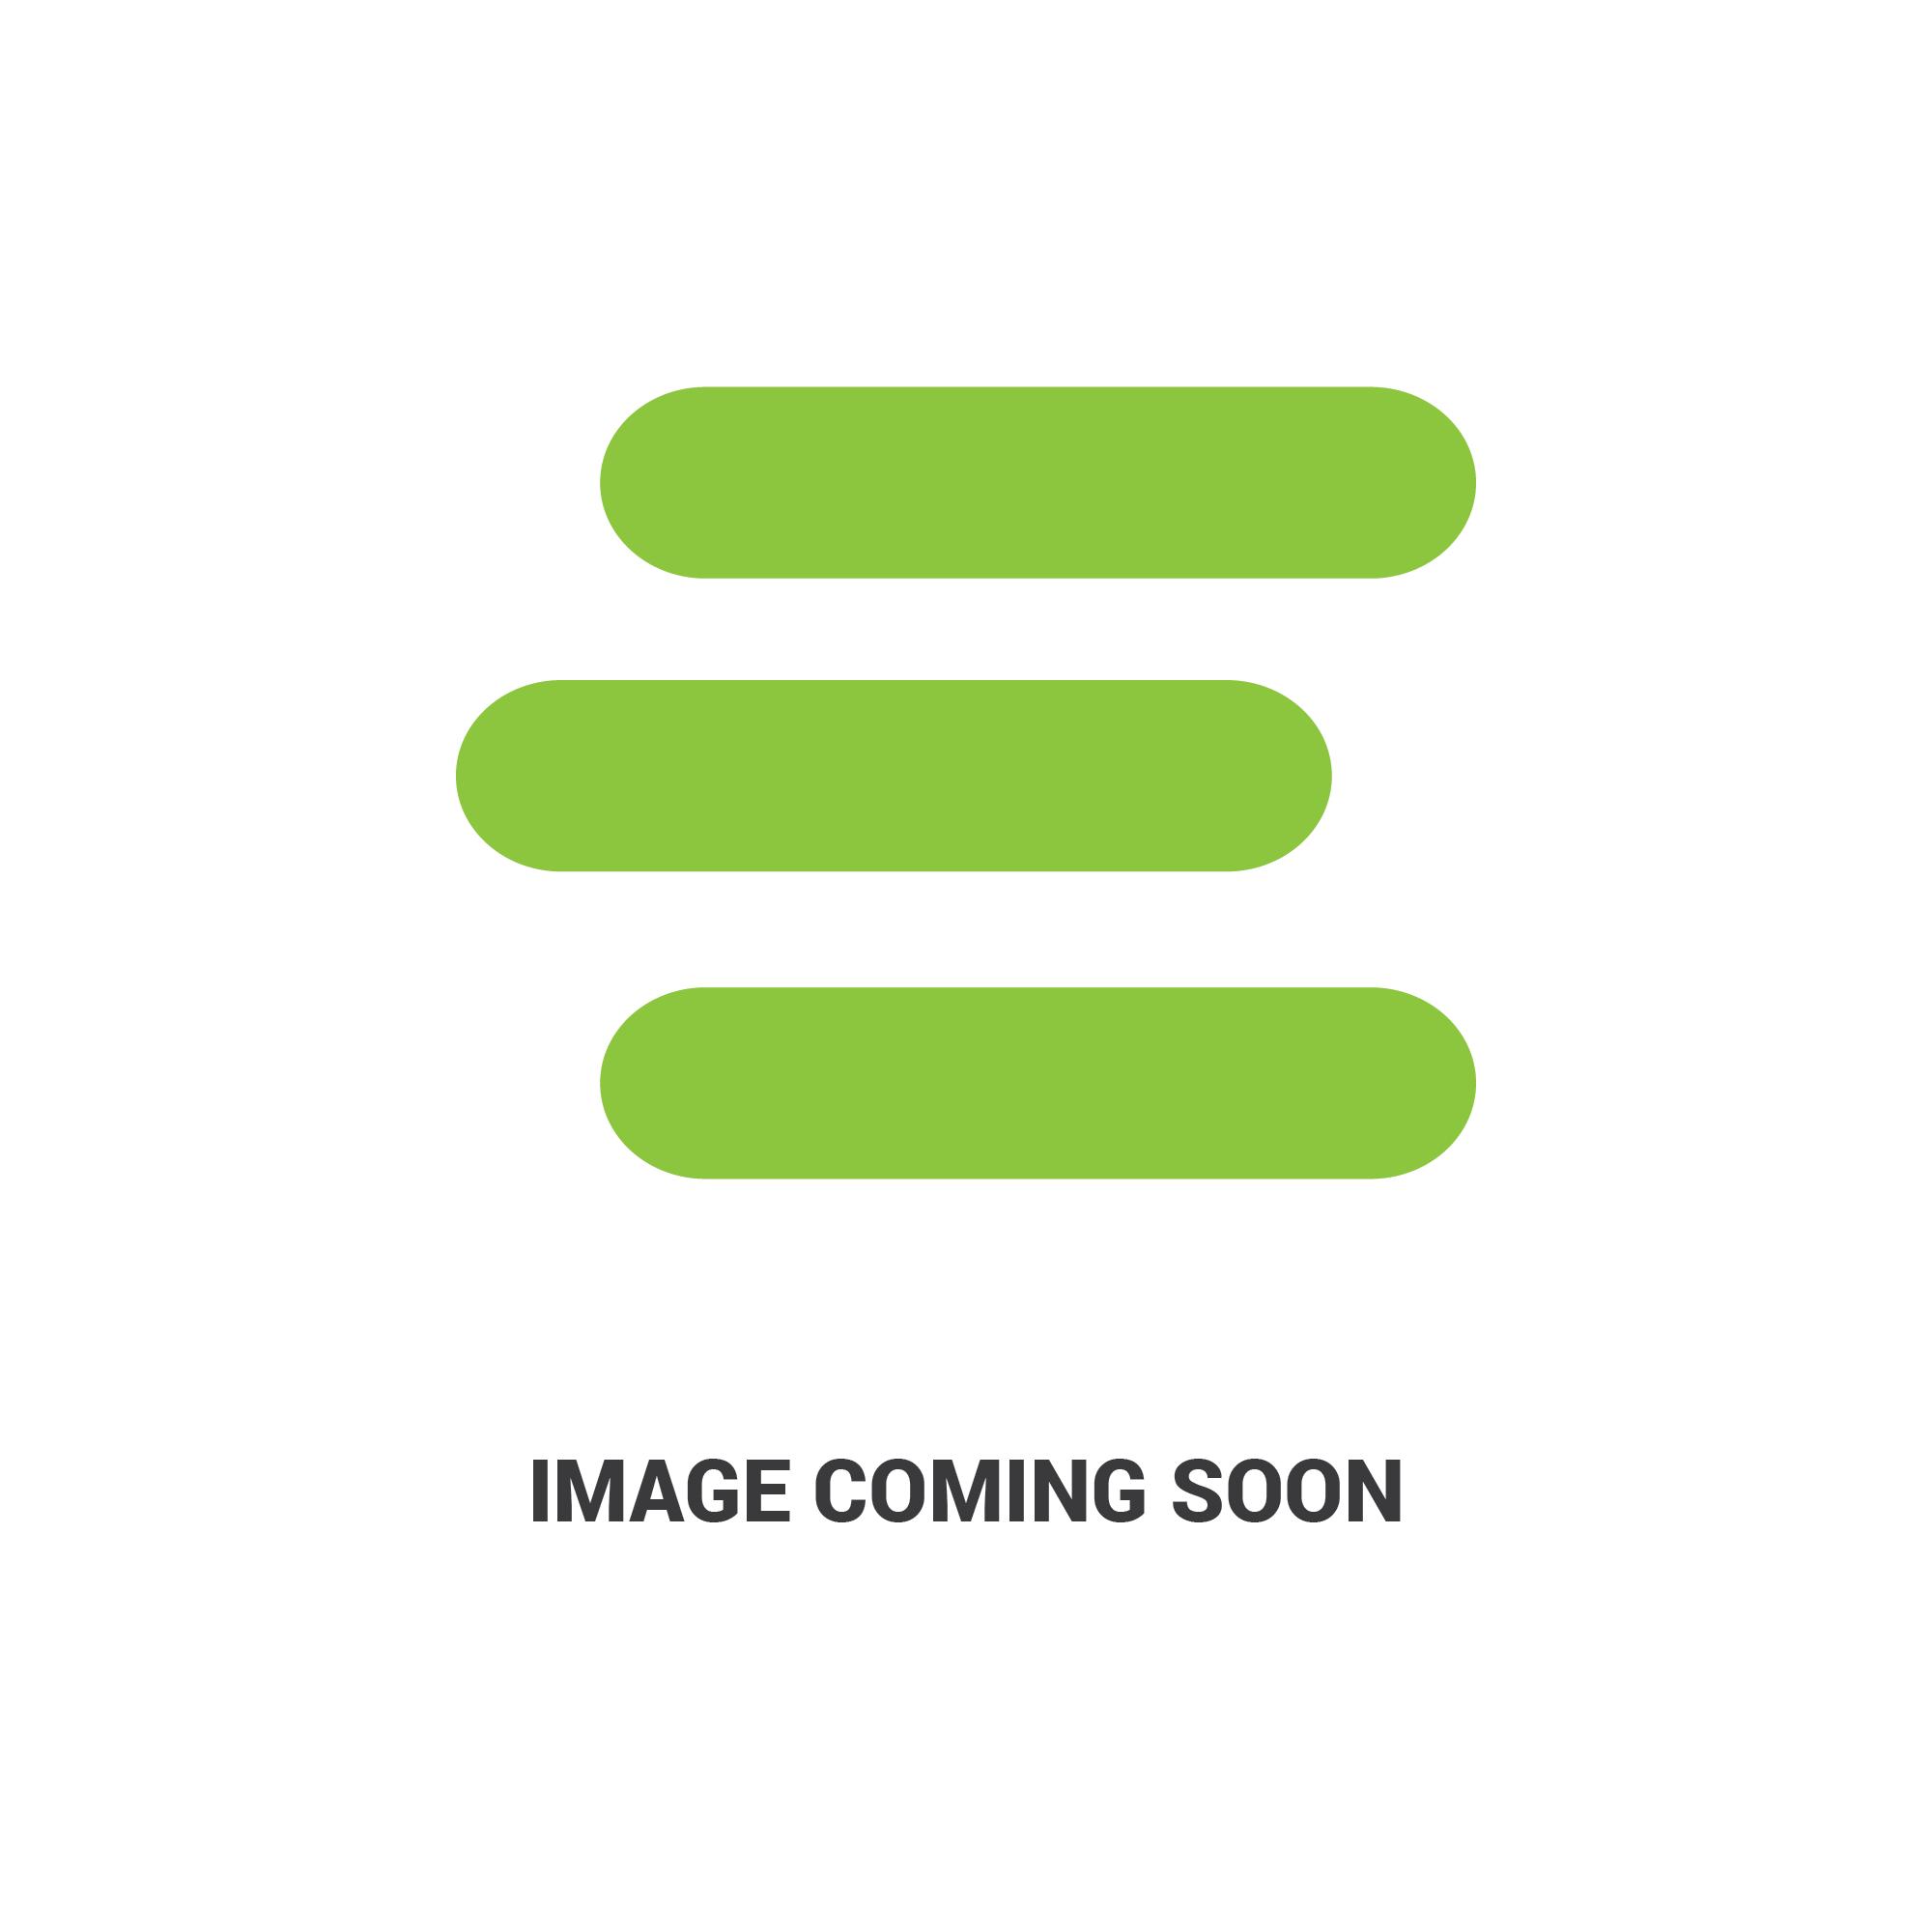 E-66527531231_1.jpg